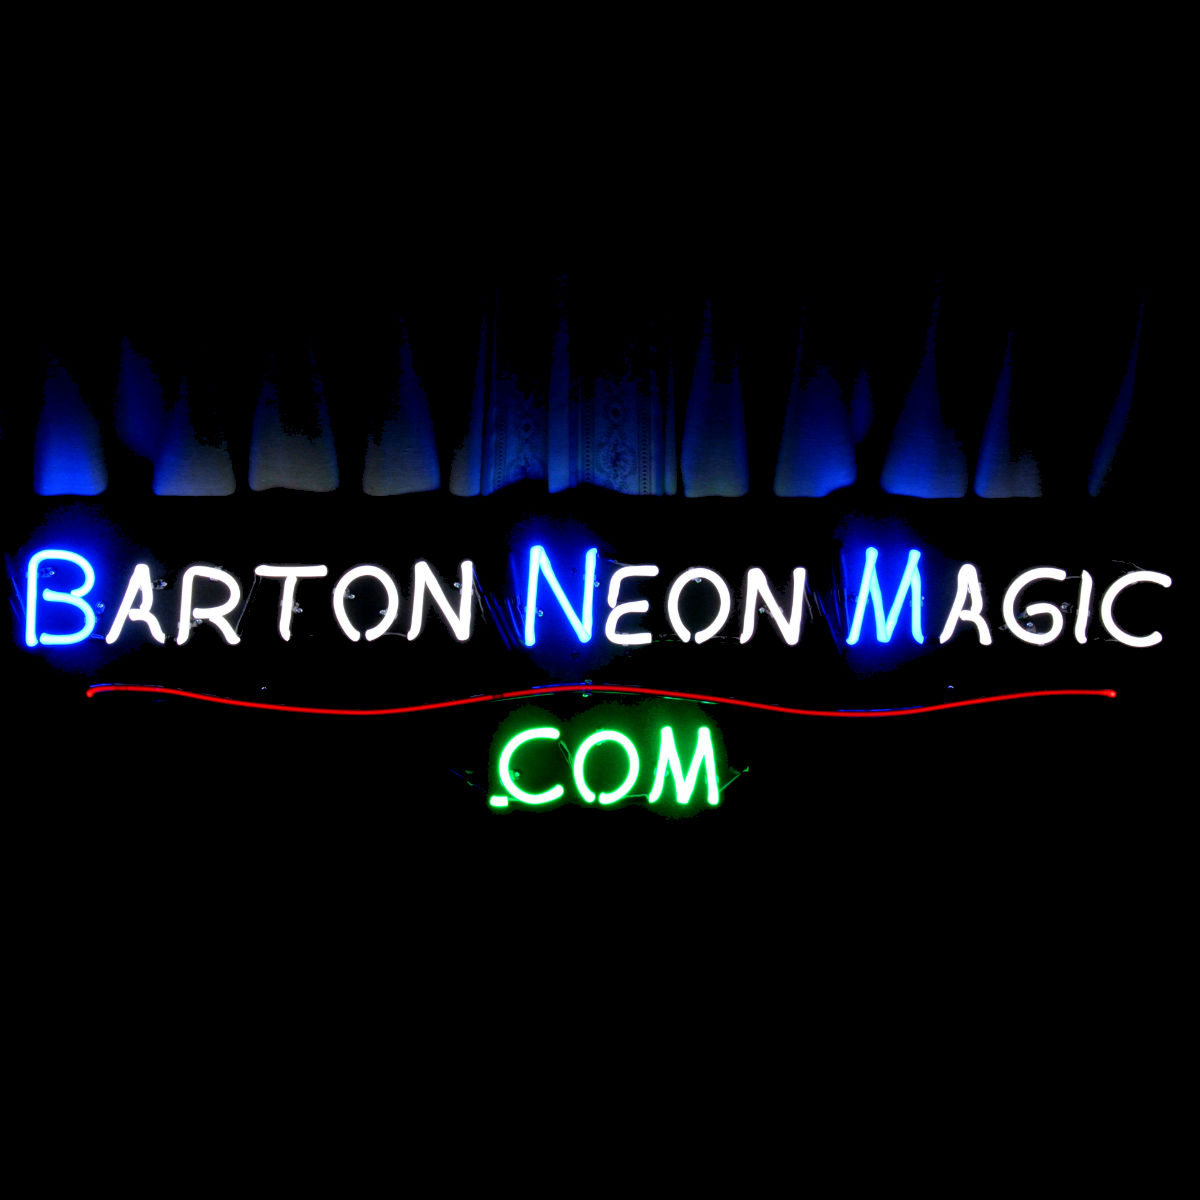 Designer Hand-blown Neon Chandeliers by John Barton - BartonNeonMagic.com